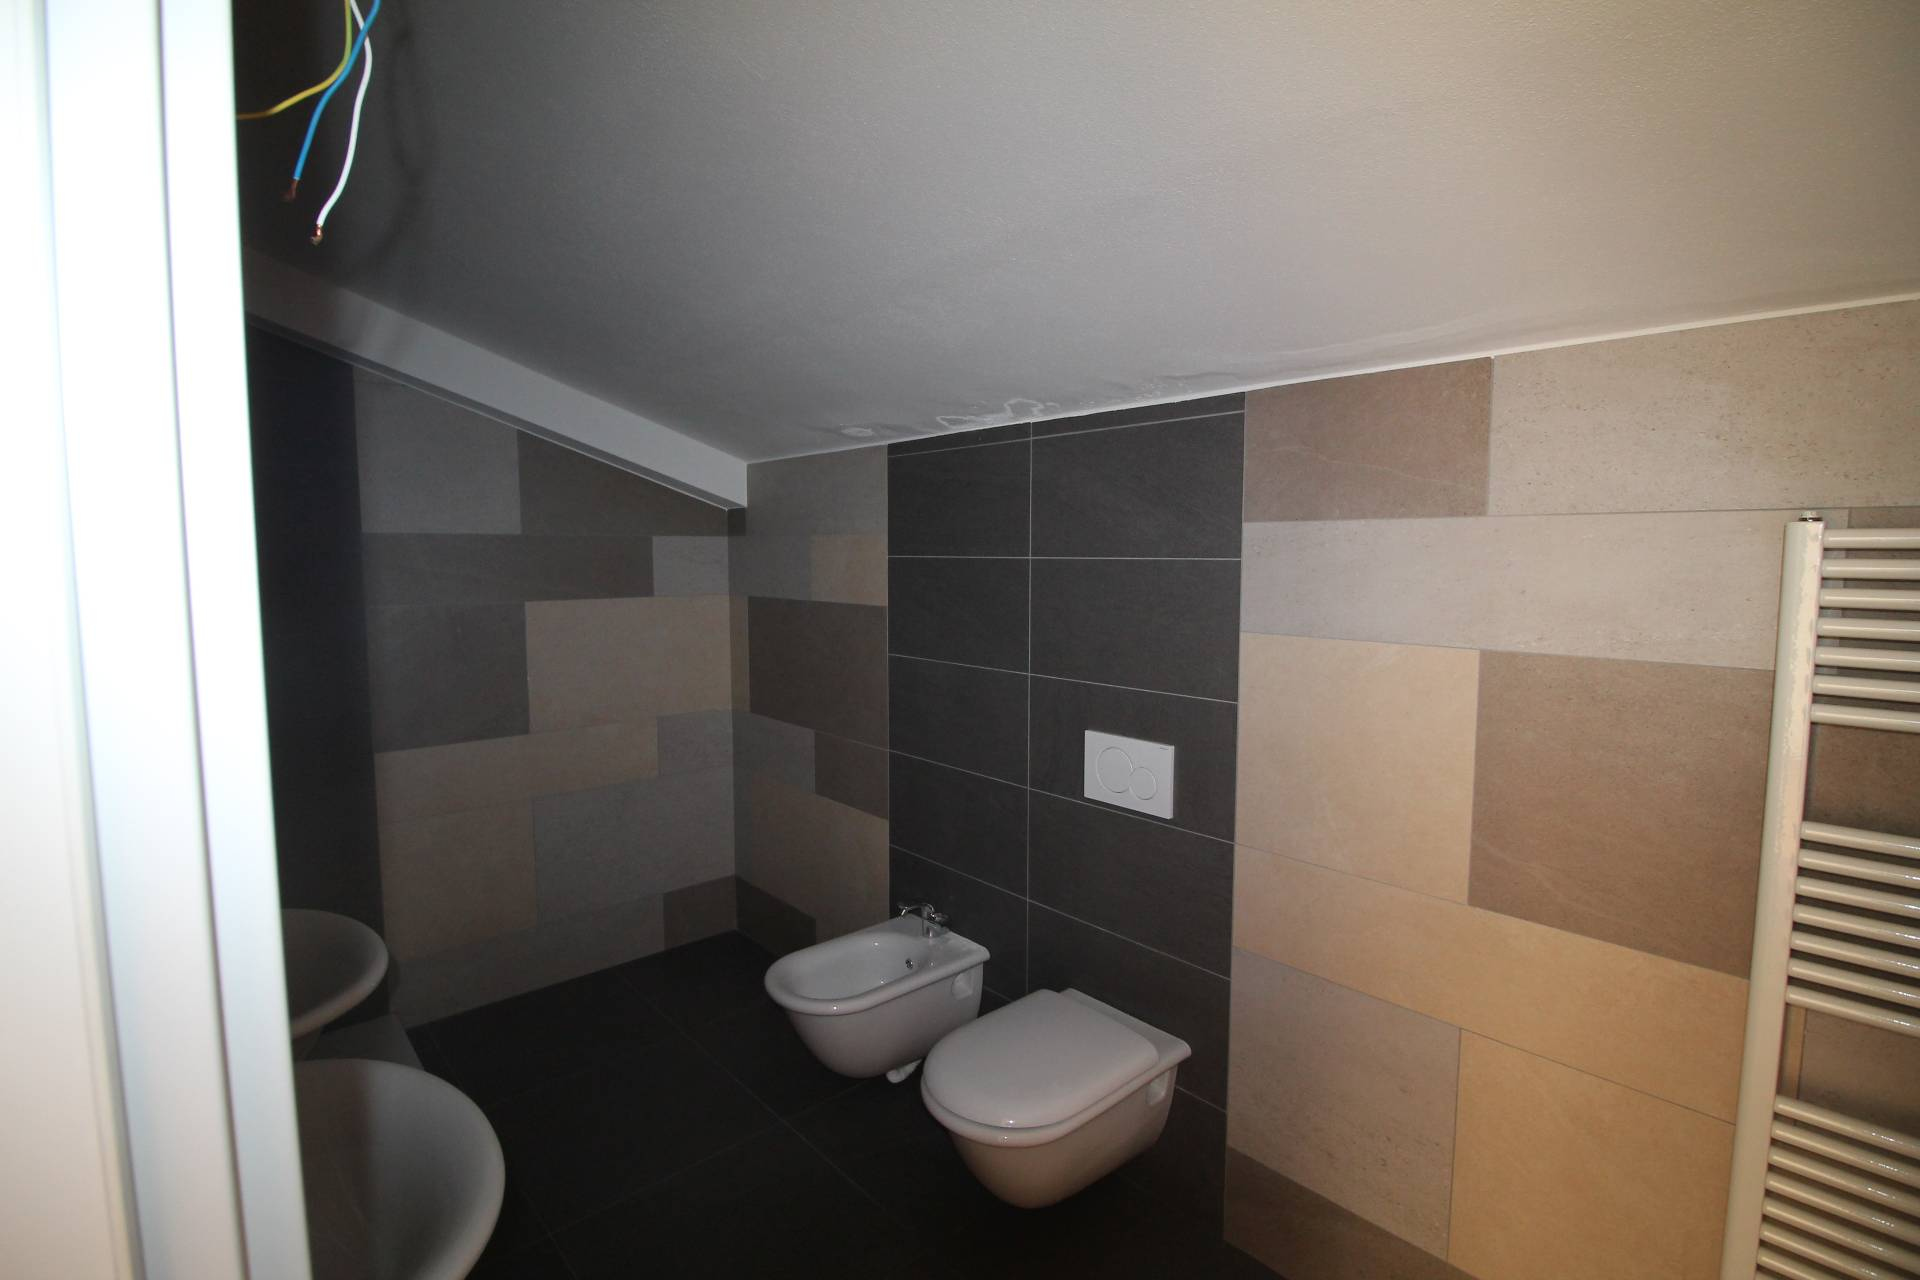 Appartamento in vendita, rif. v2417B